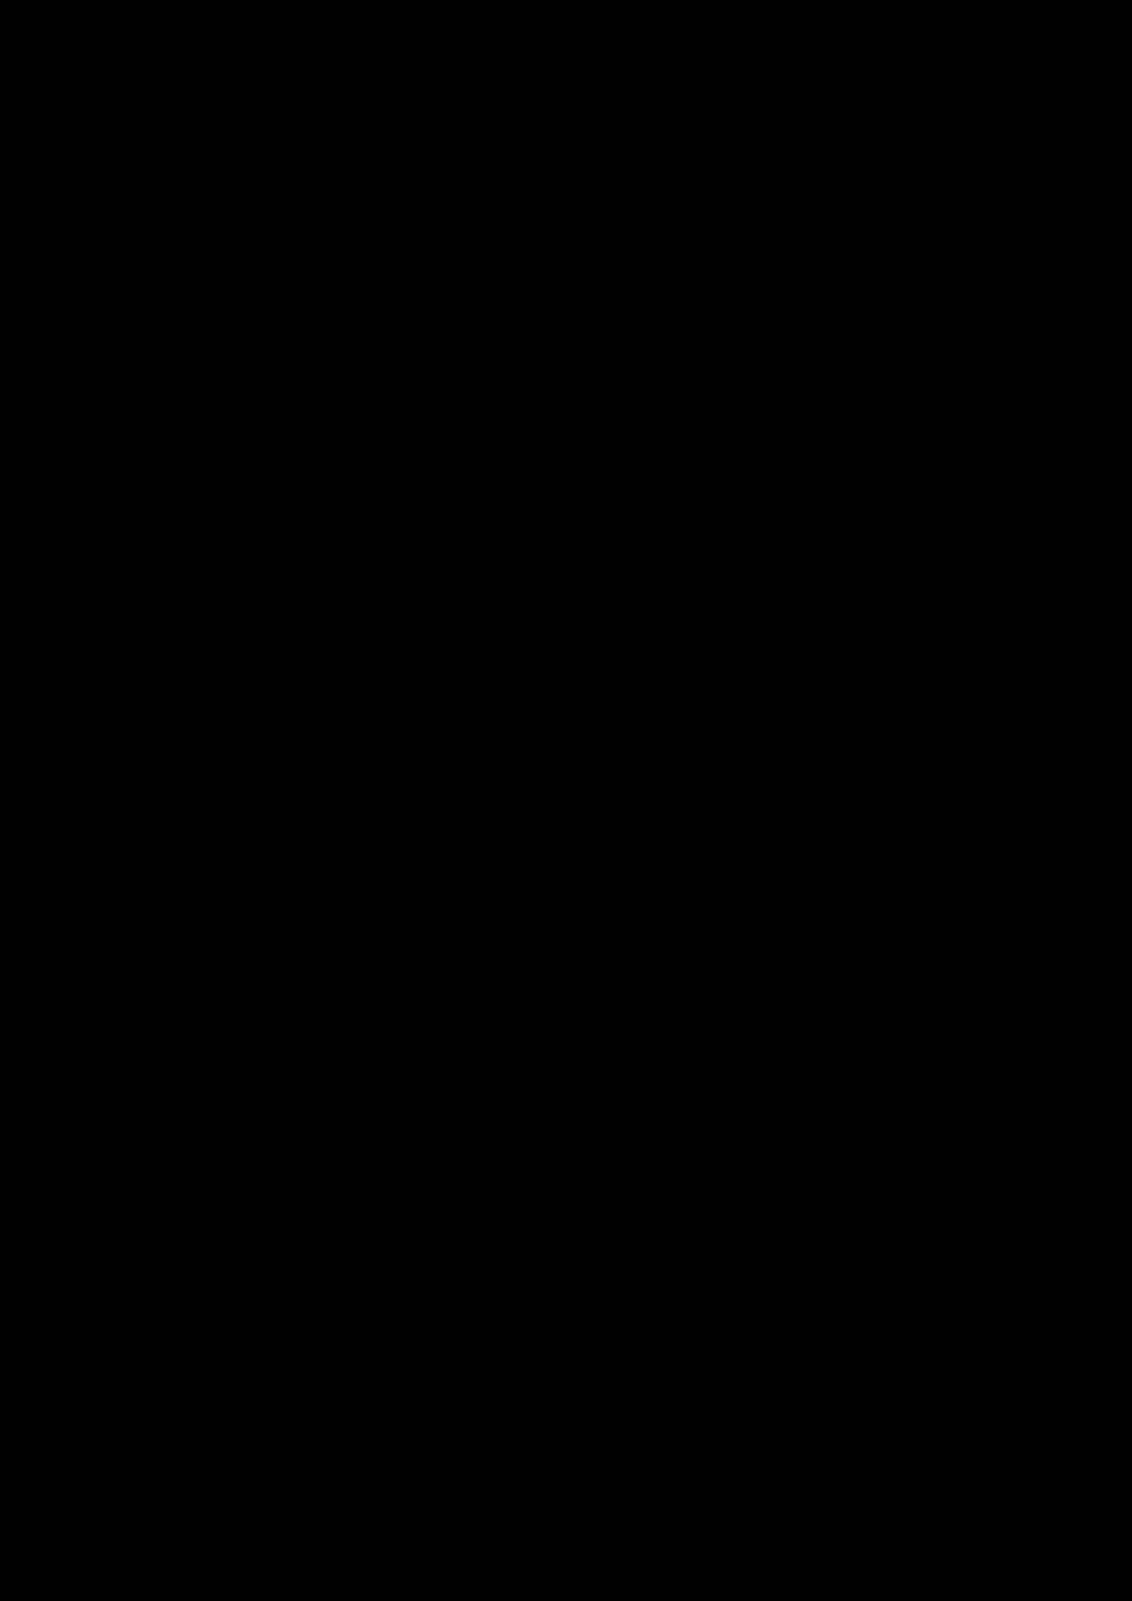 Mrs. Vandebilt slide, Image 57